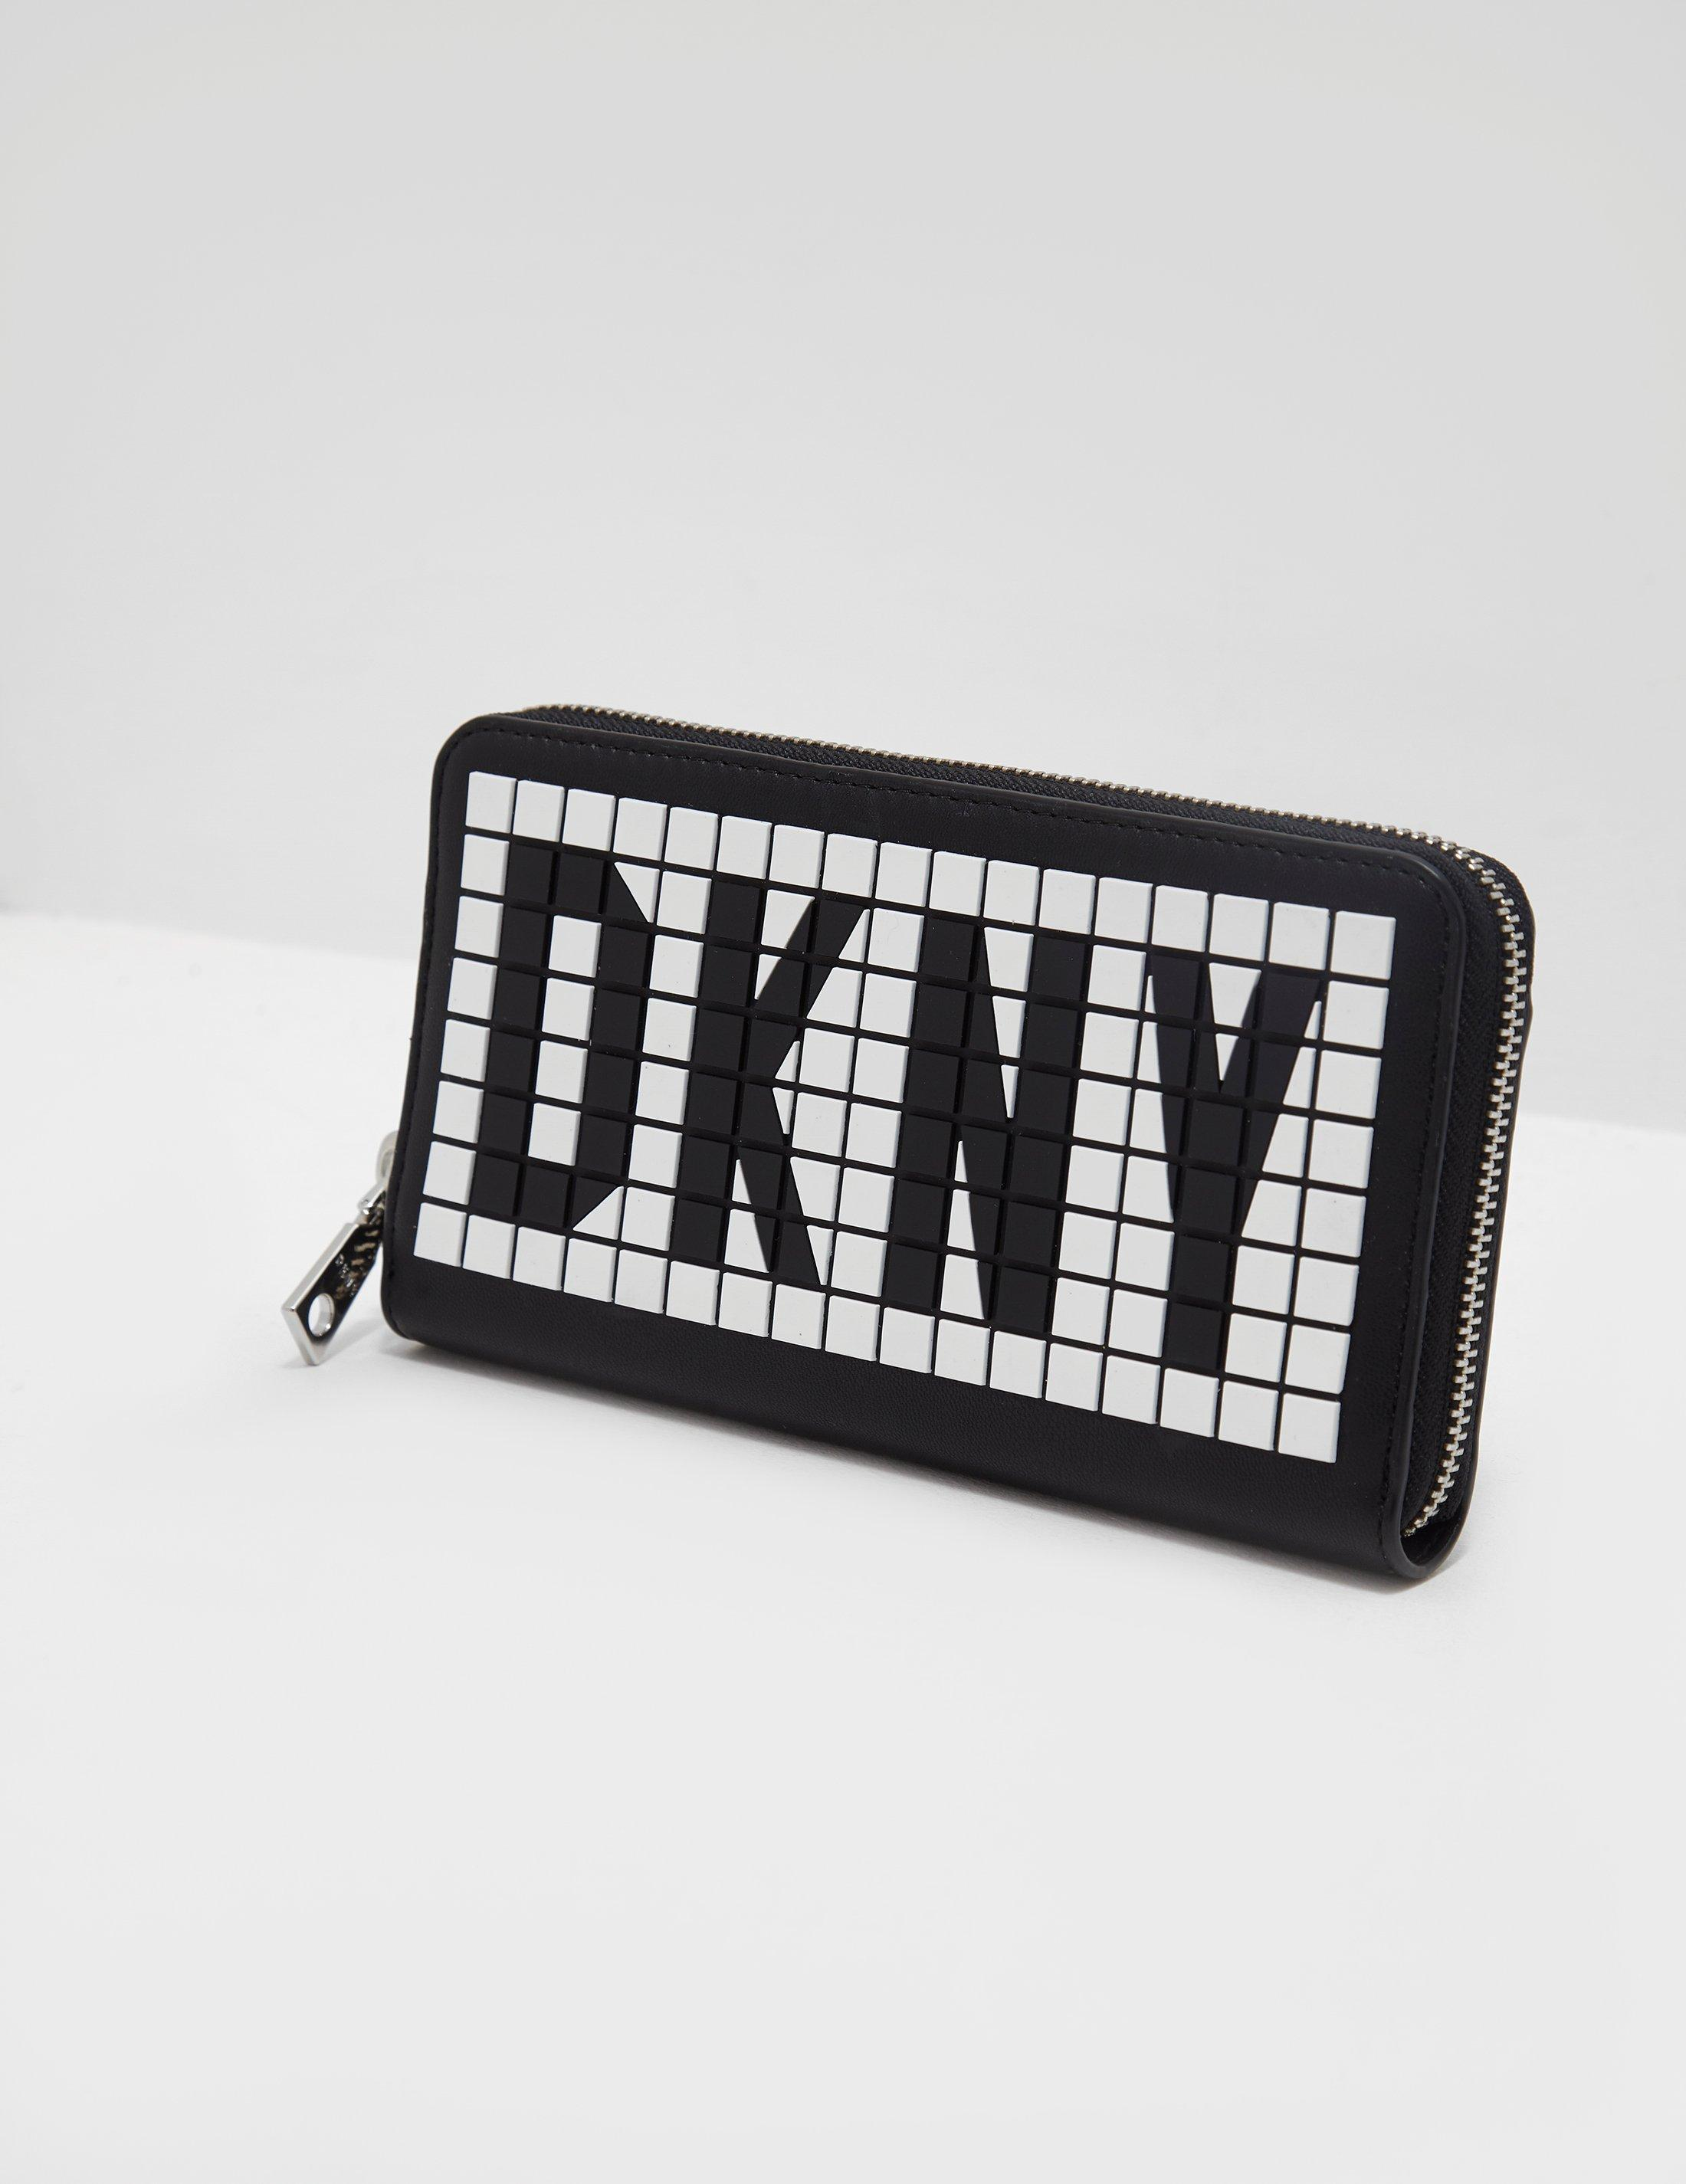 f670445b27add8 DKNY Tilly Letter Purse Black in Black - Save 21% - Lyst